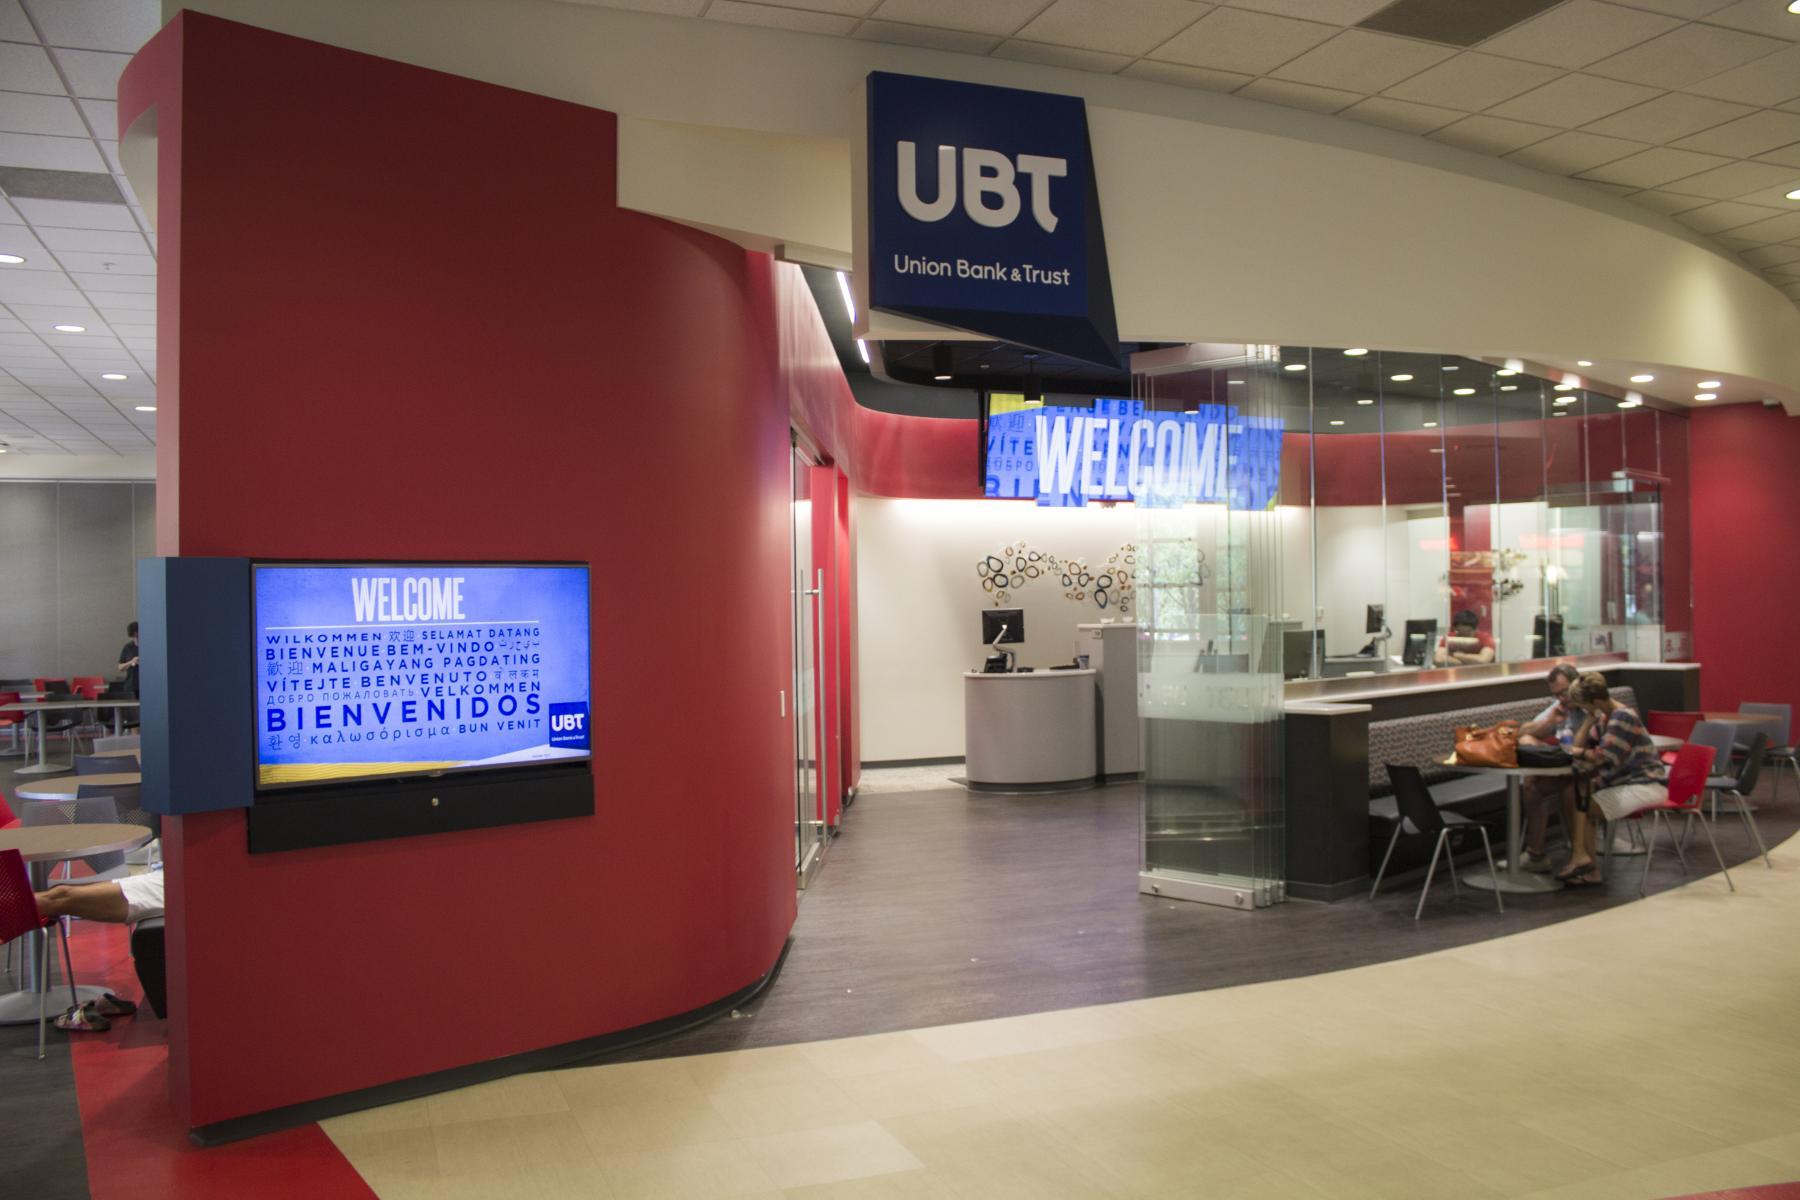 union bank and trust omaha